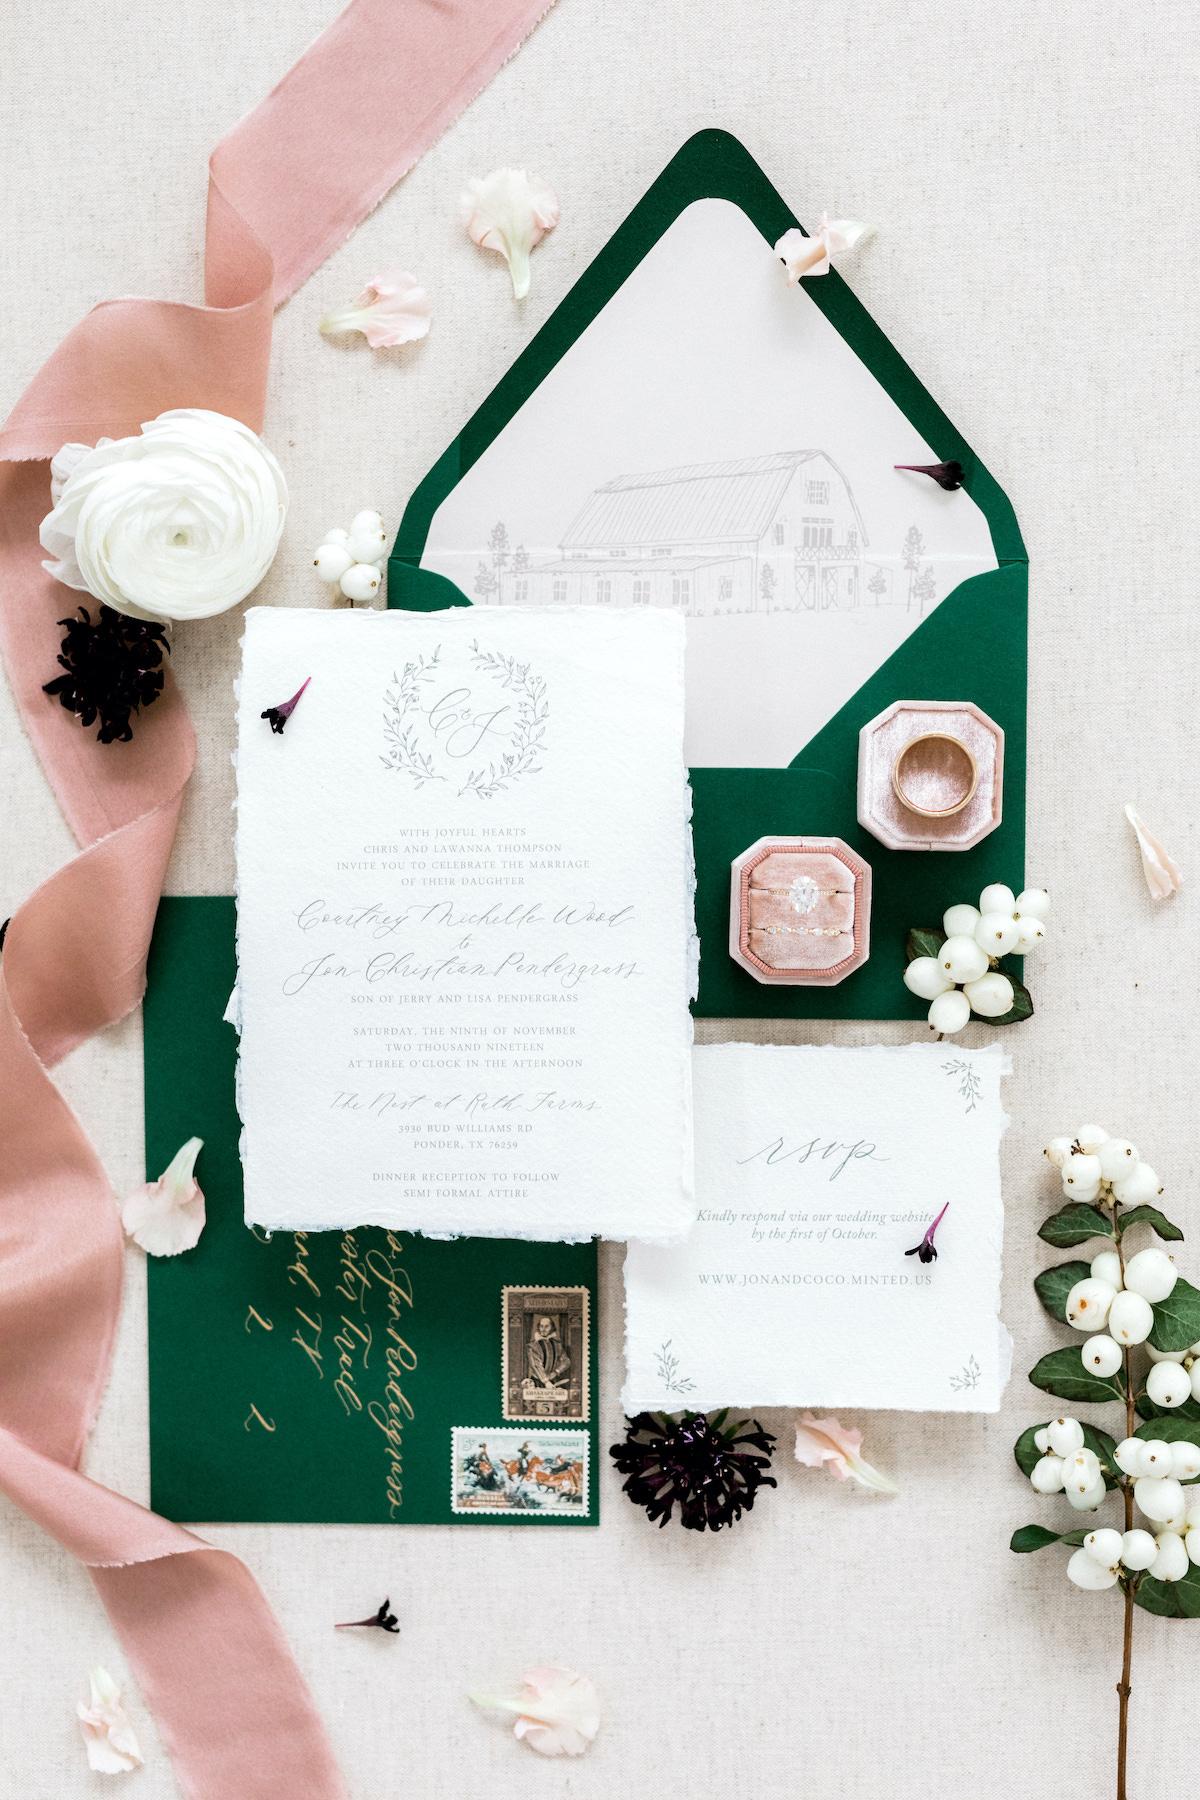 dark green, white and pink wedding invitations